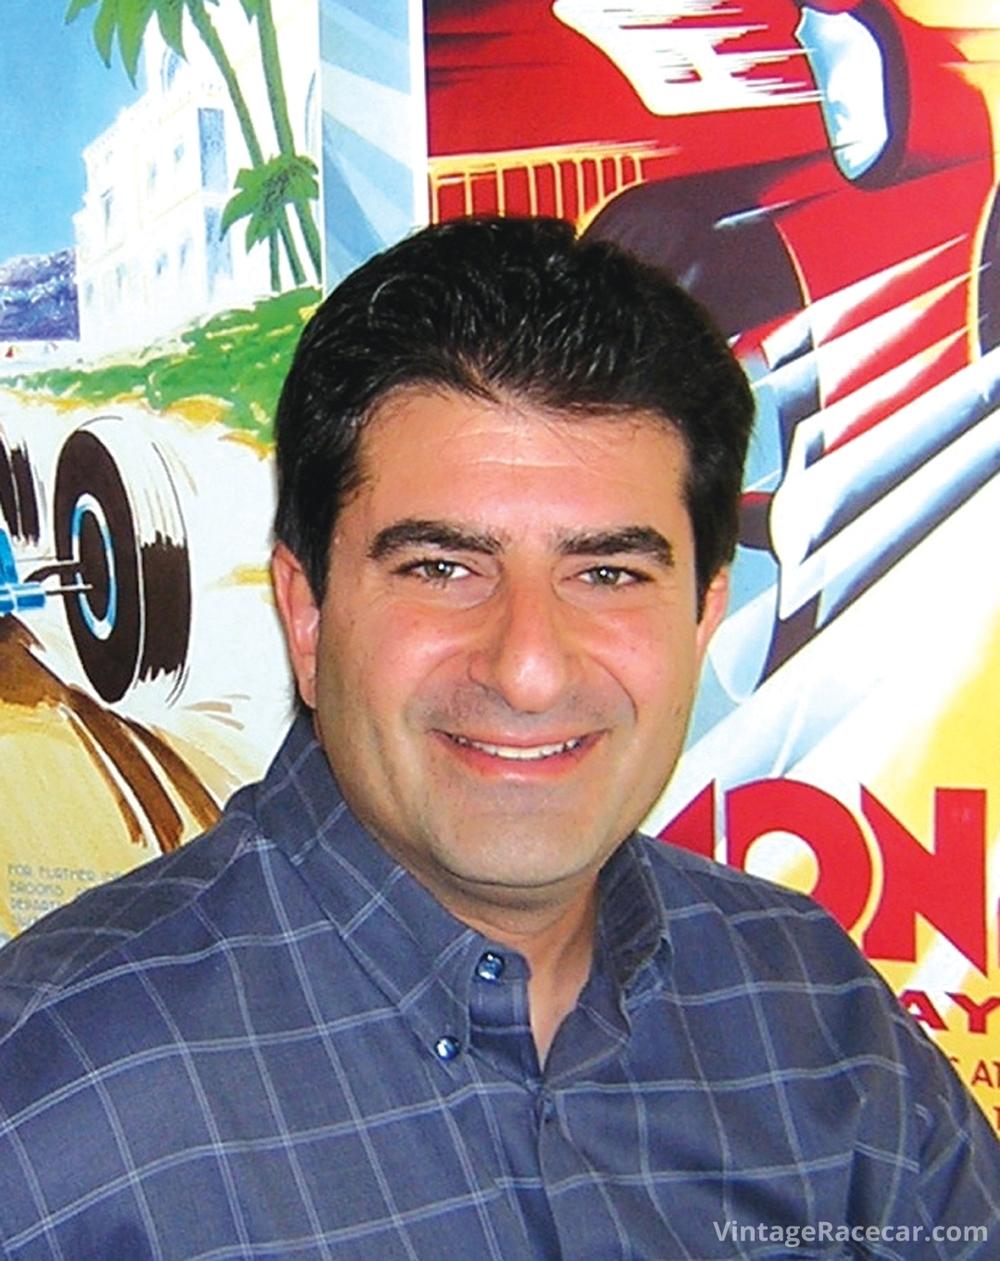 Raffi Minasian